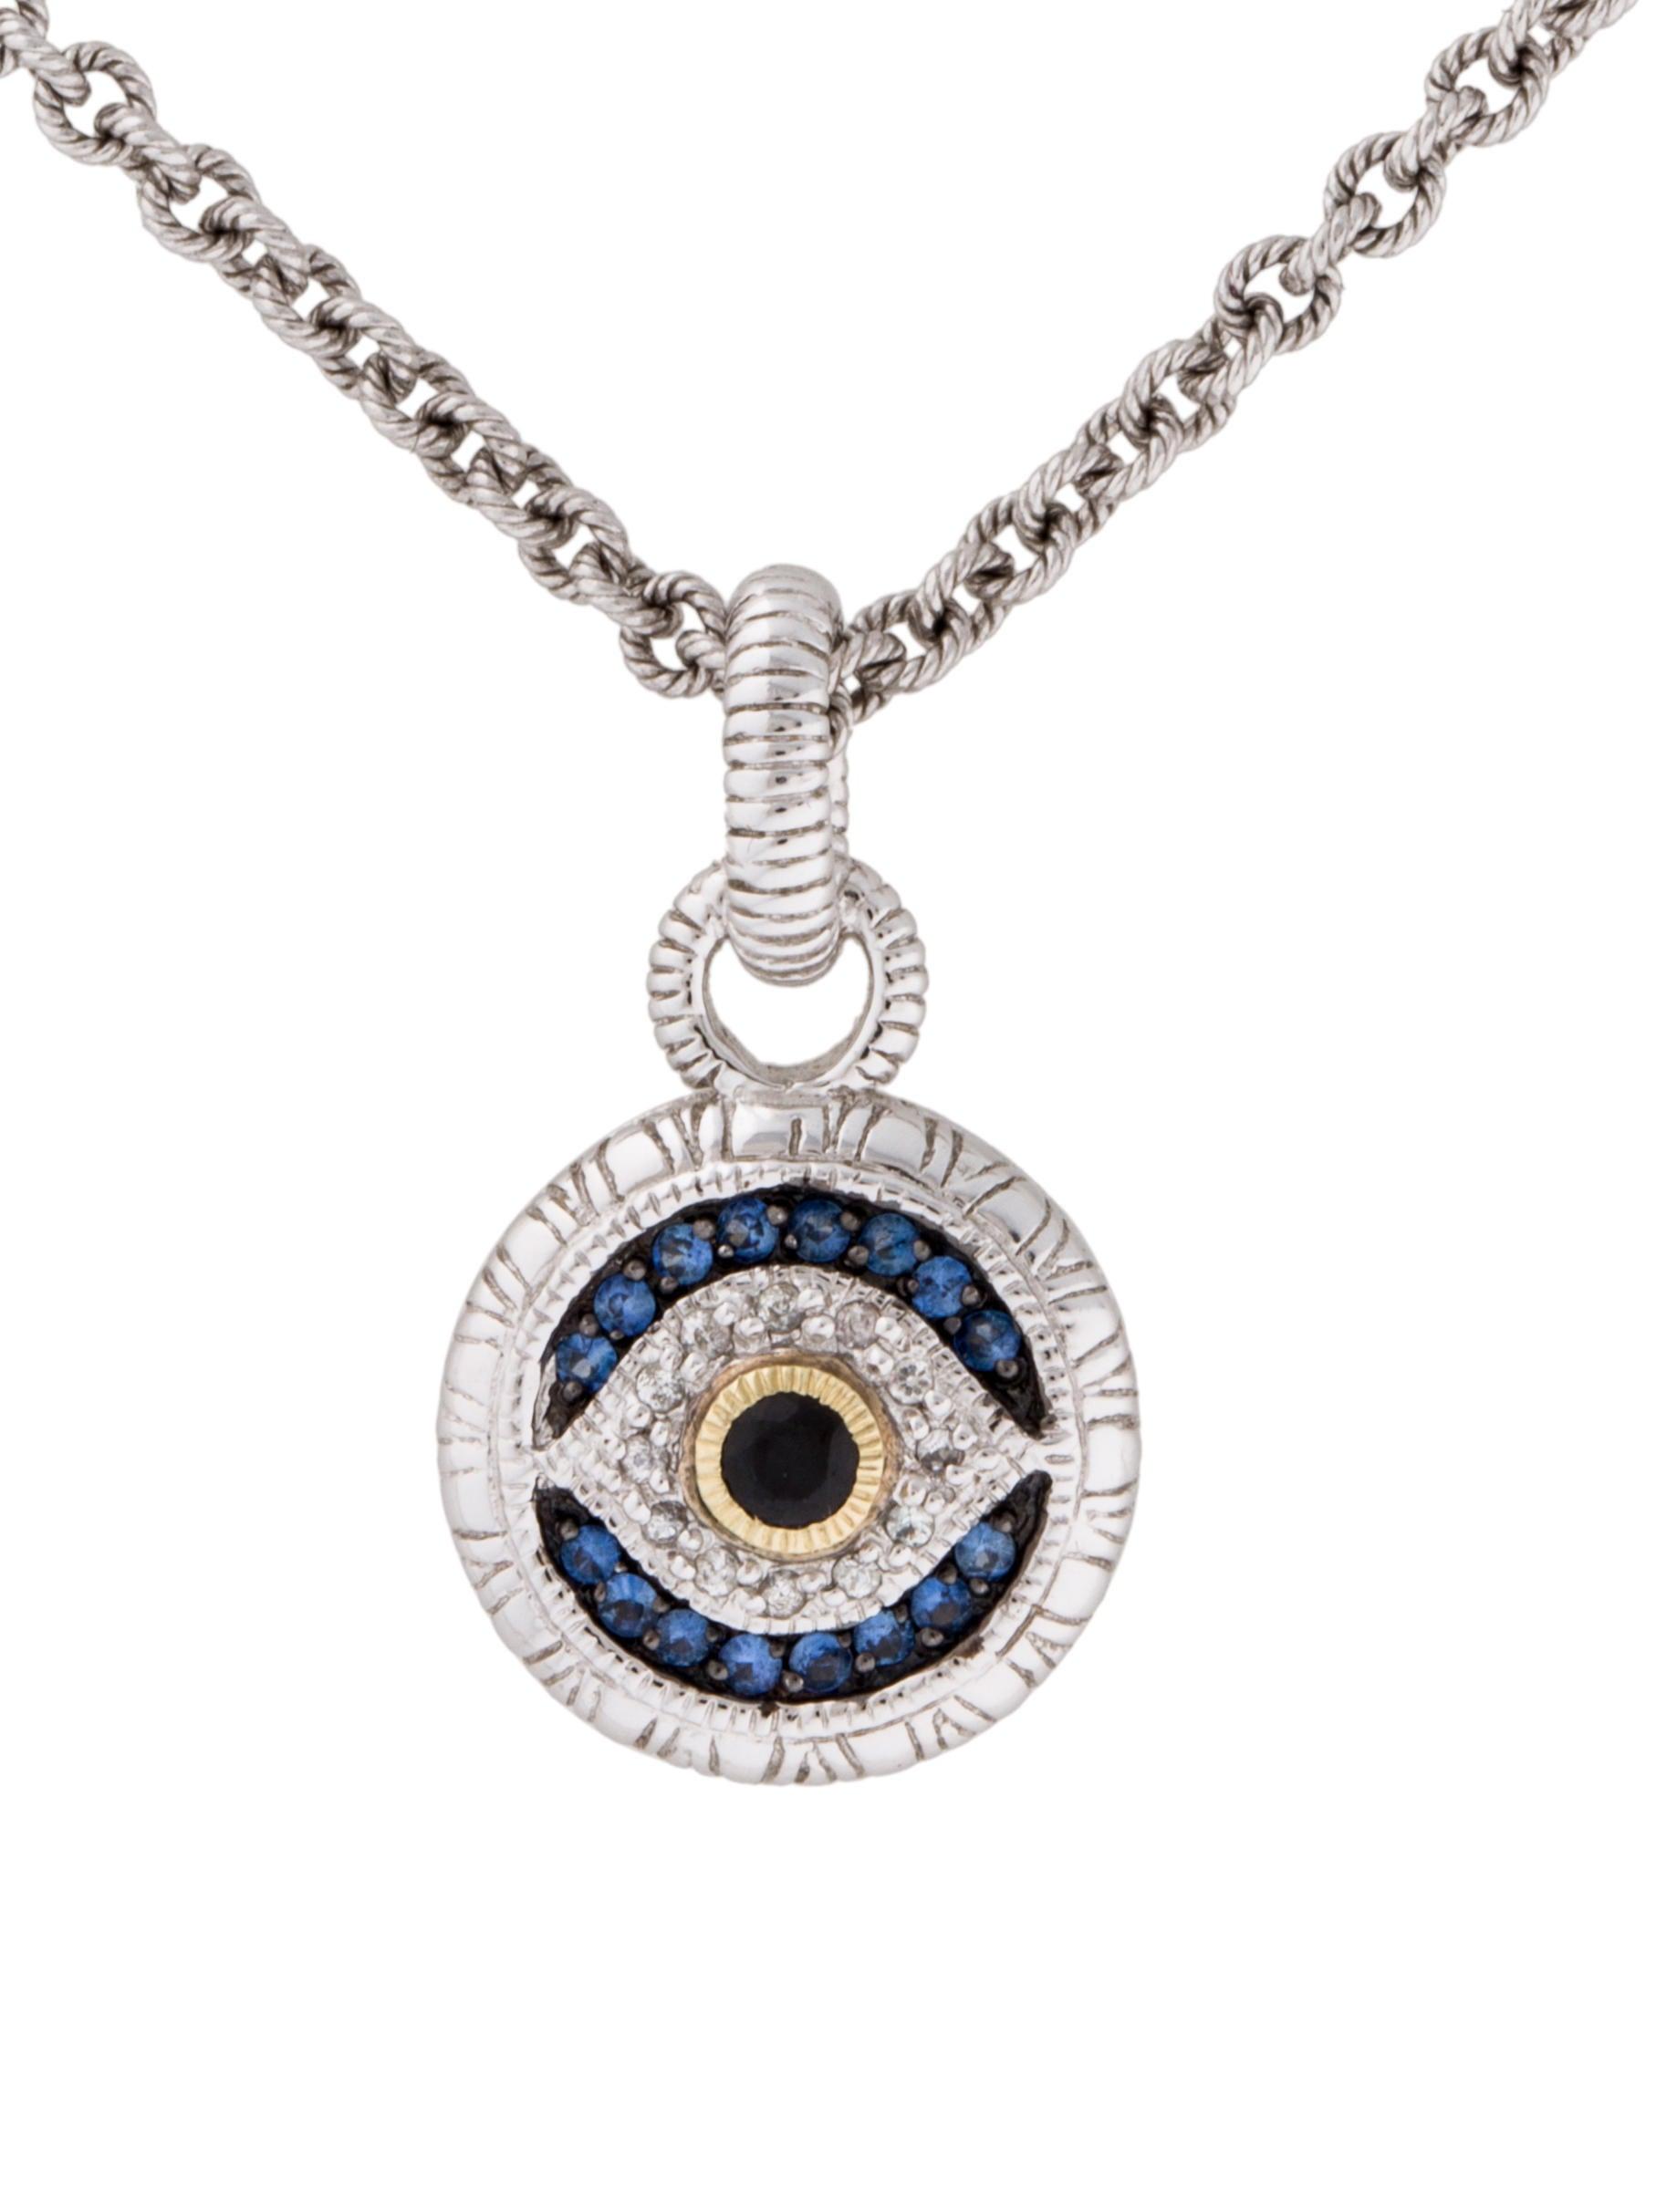 judith ripka evil eye necklace necklaces jrk21234